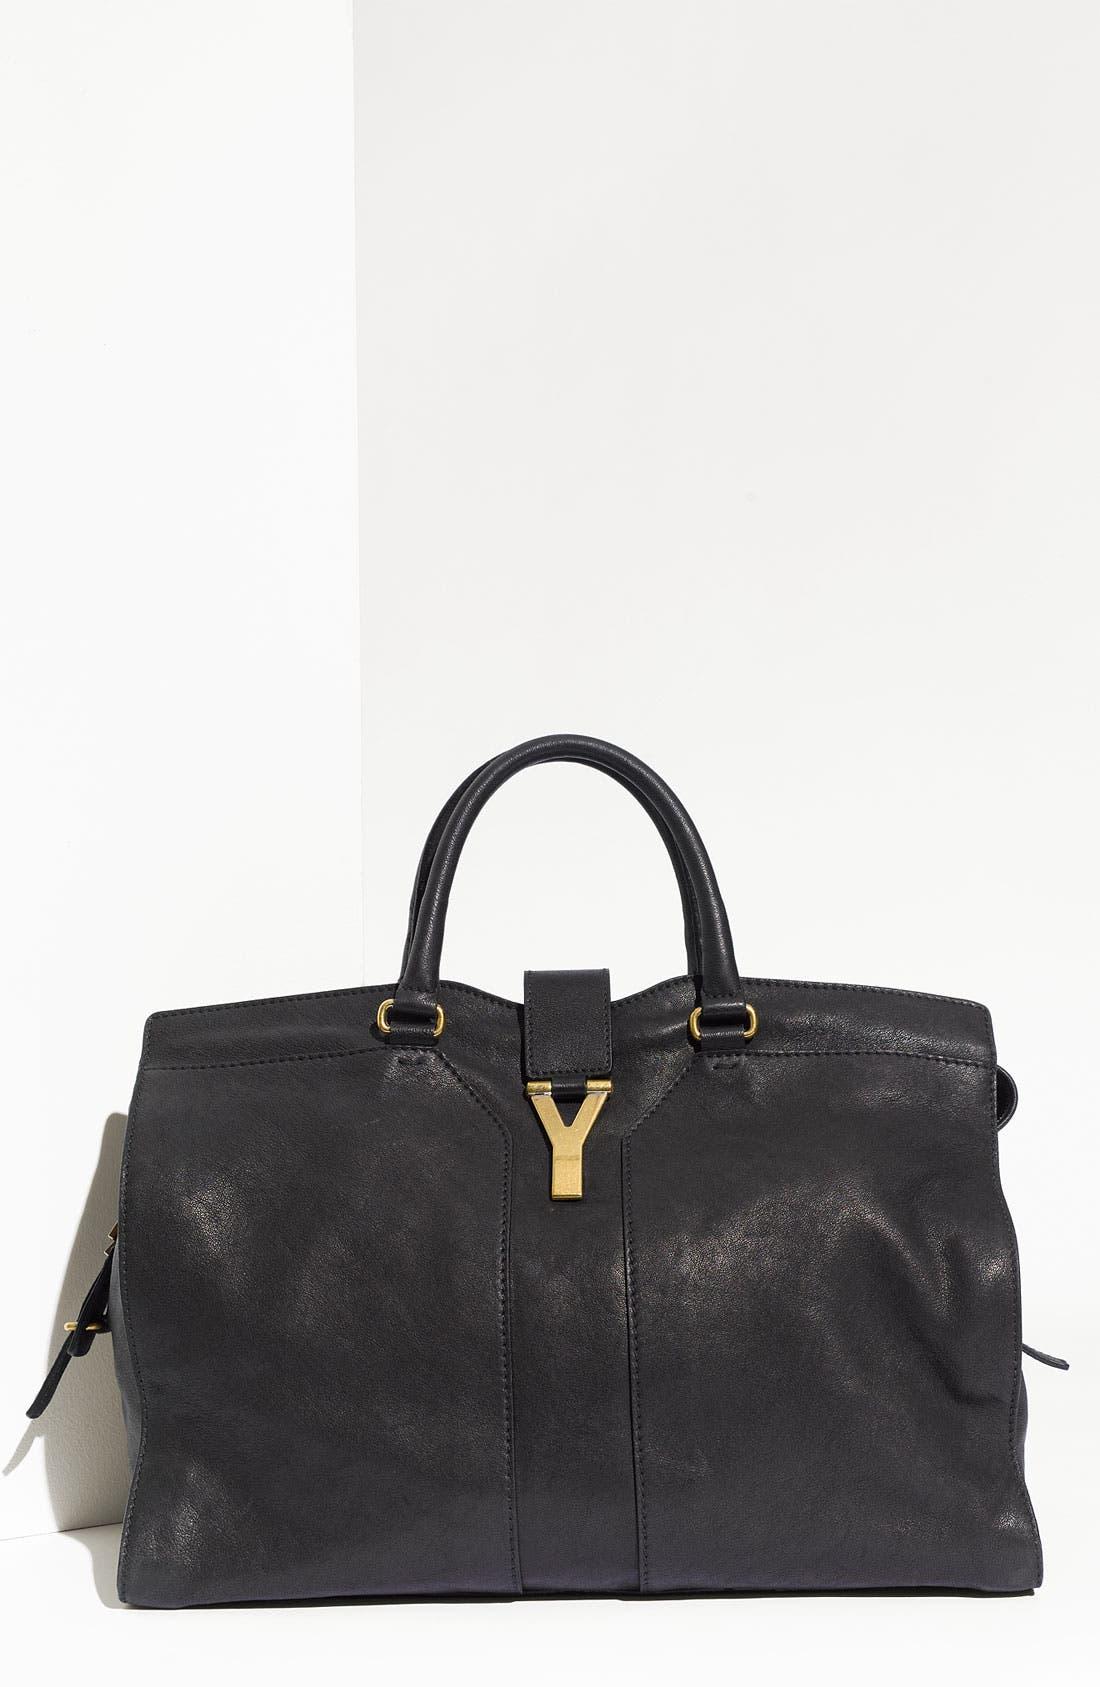 Alternate Image 1 Selected - Yves Saint Laurent Paris 'Cabas Chyc - Large' Leather Satchel